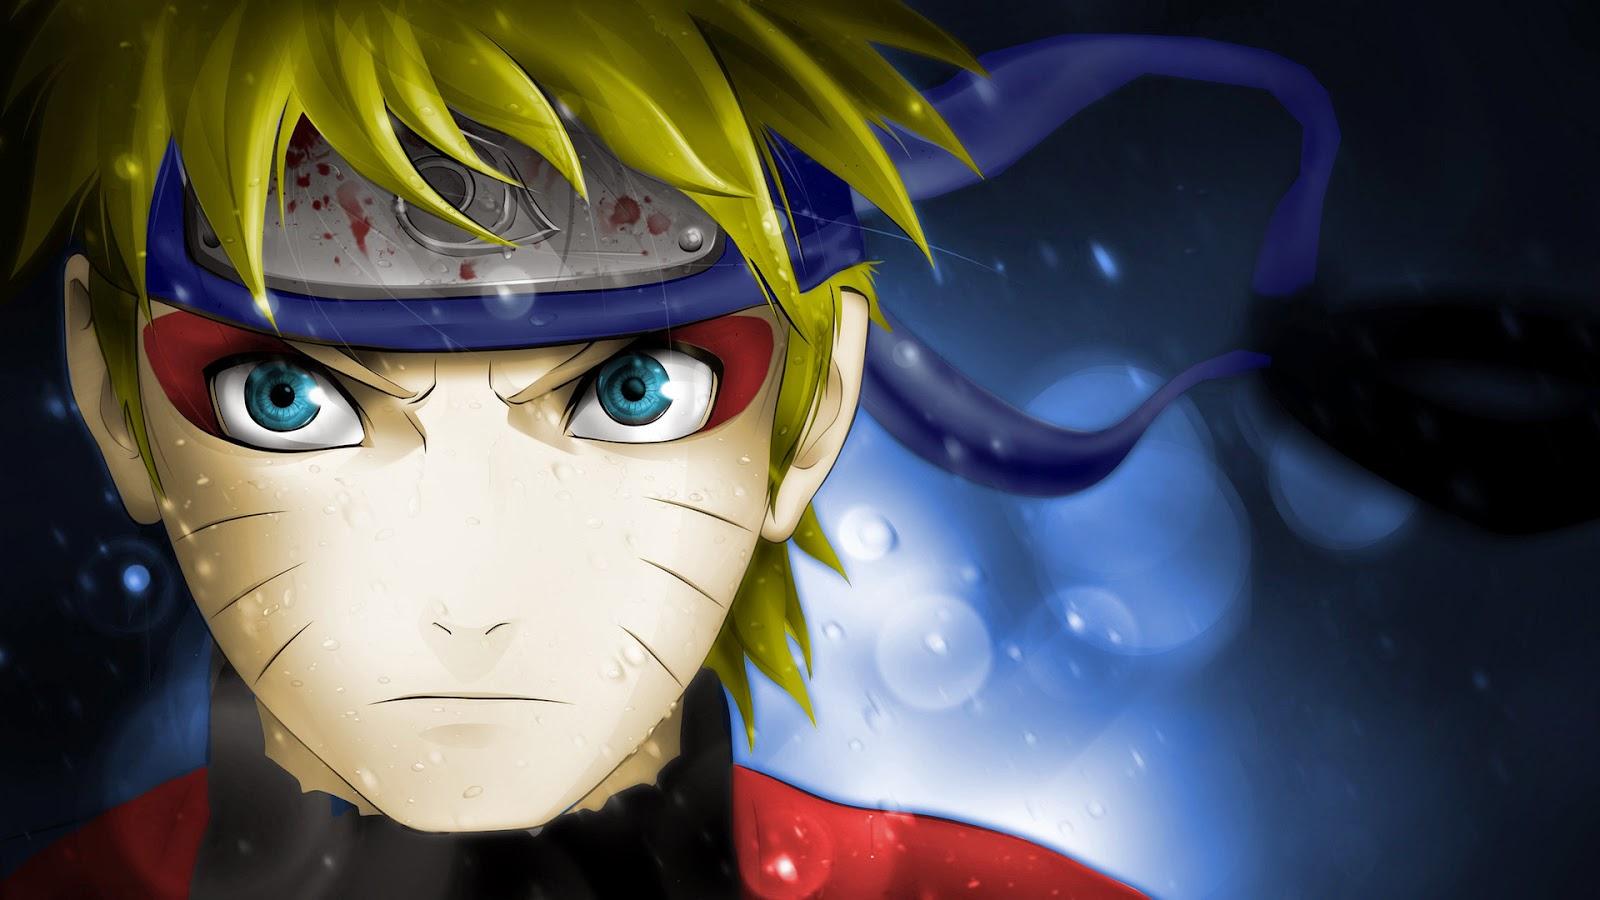 Wallpaper Iphone Hd Keren Naruto Wallpaper Set Movie Download Gamebilla